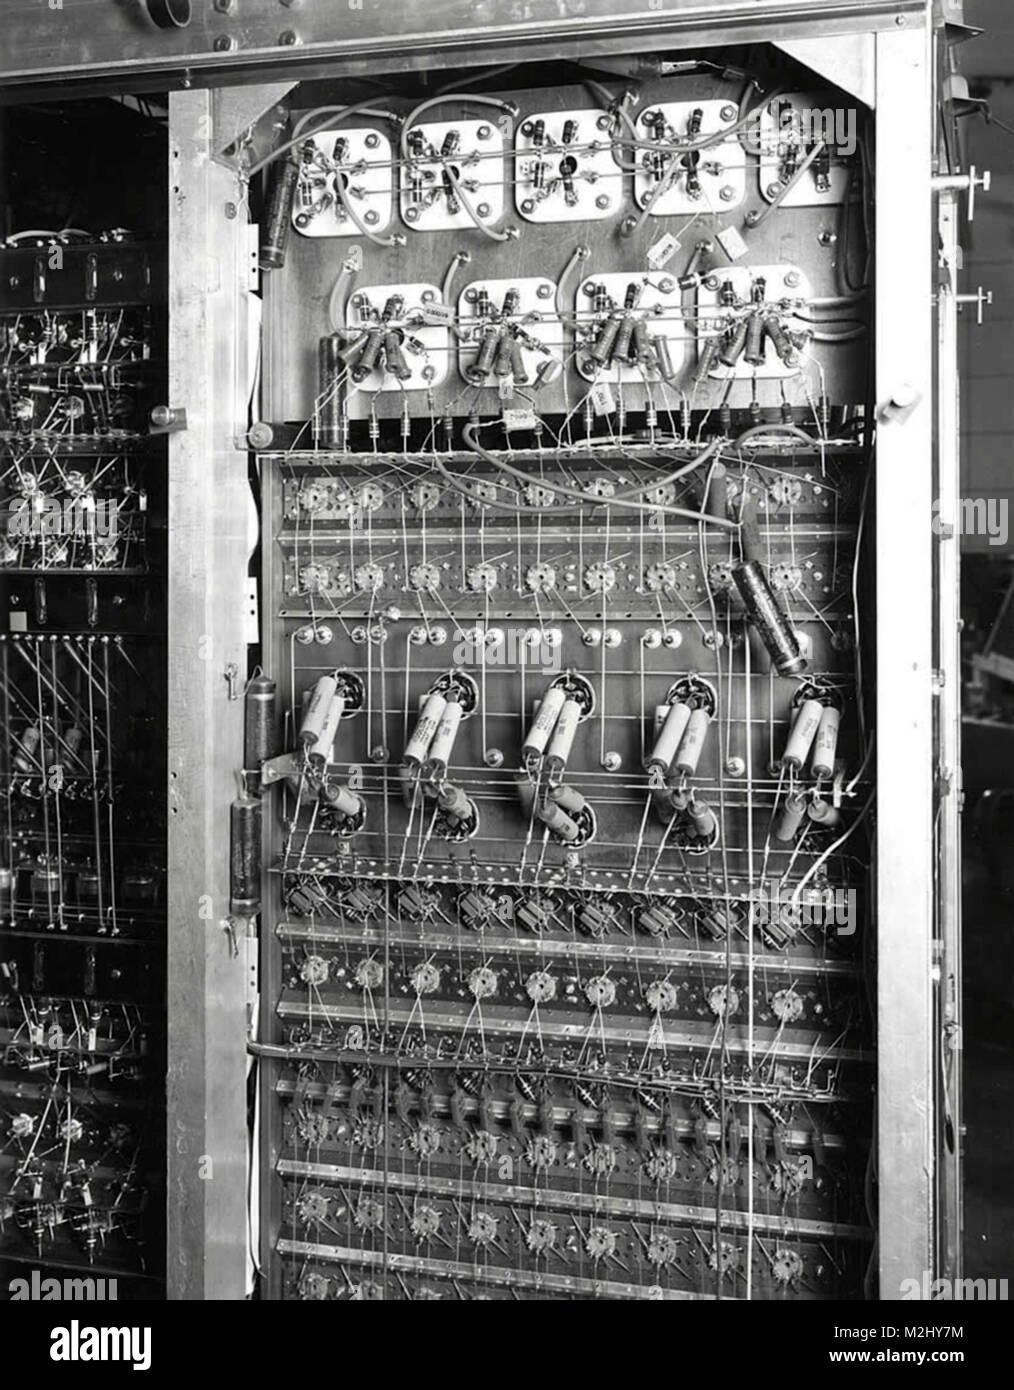 MANIAC-III, Solid State Electronics, 1961 - Stock Image